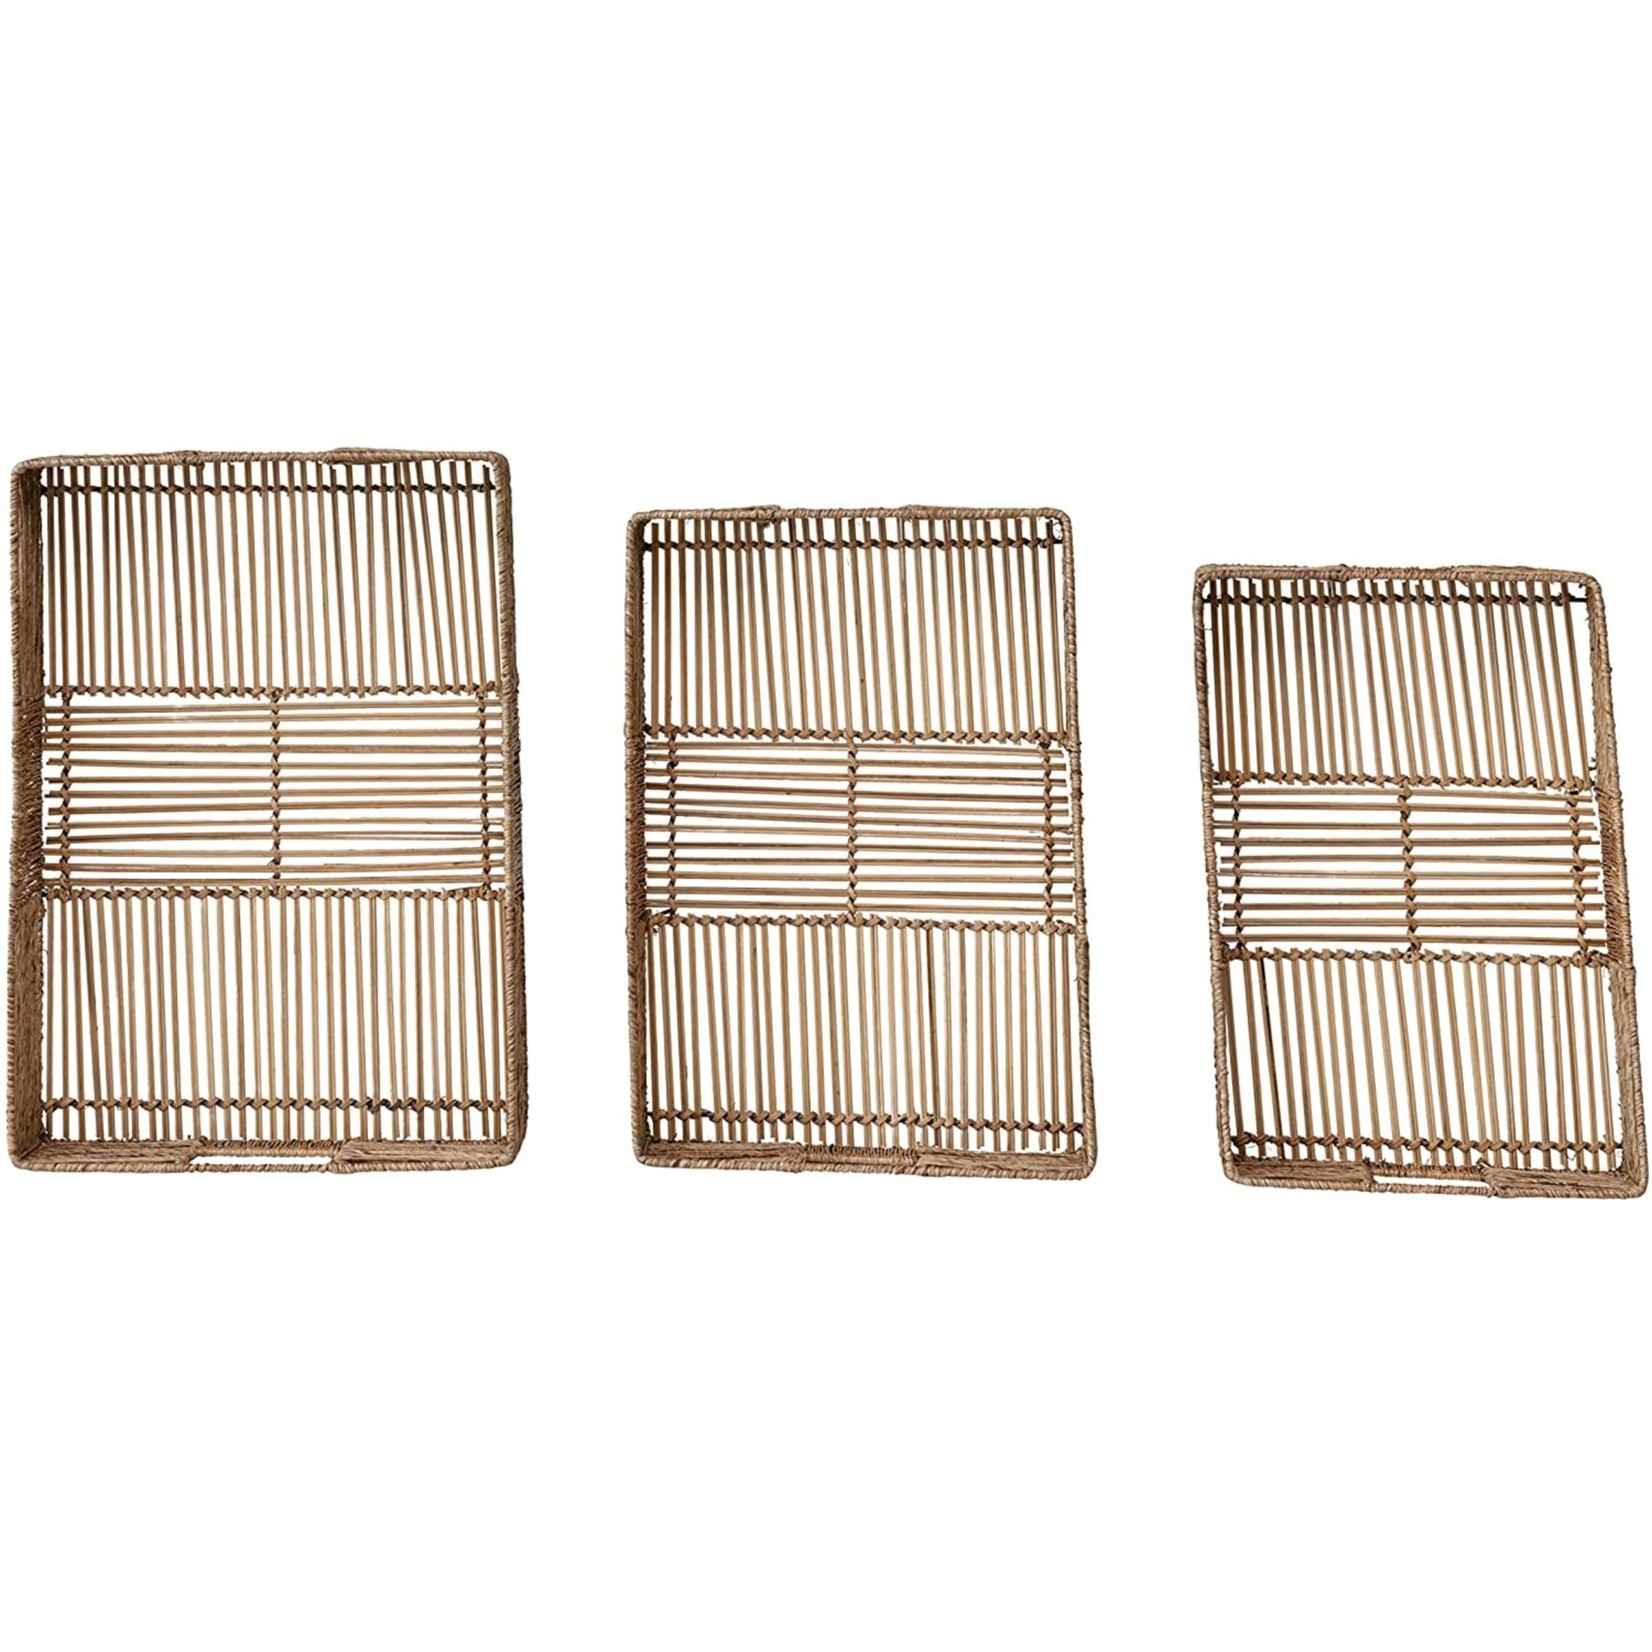 Bamboo & Jute Tray (Multiple Sizes)